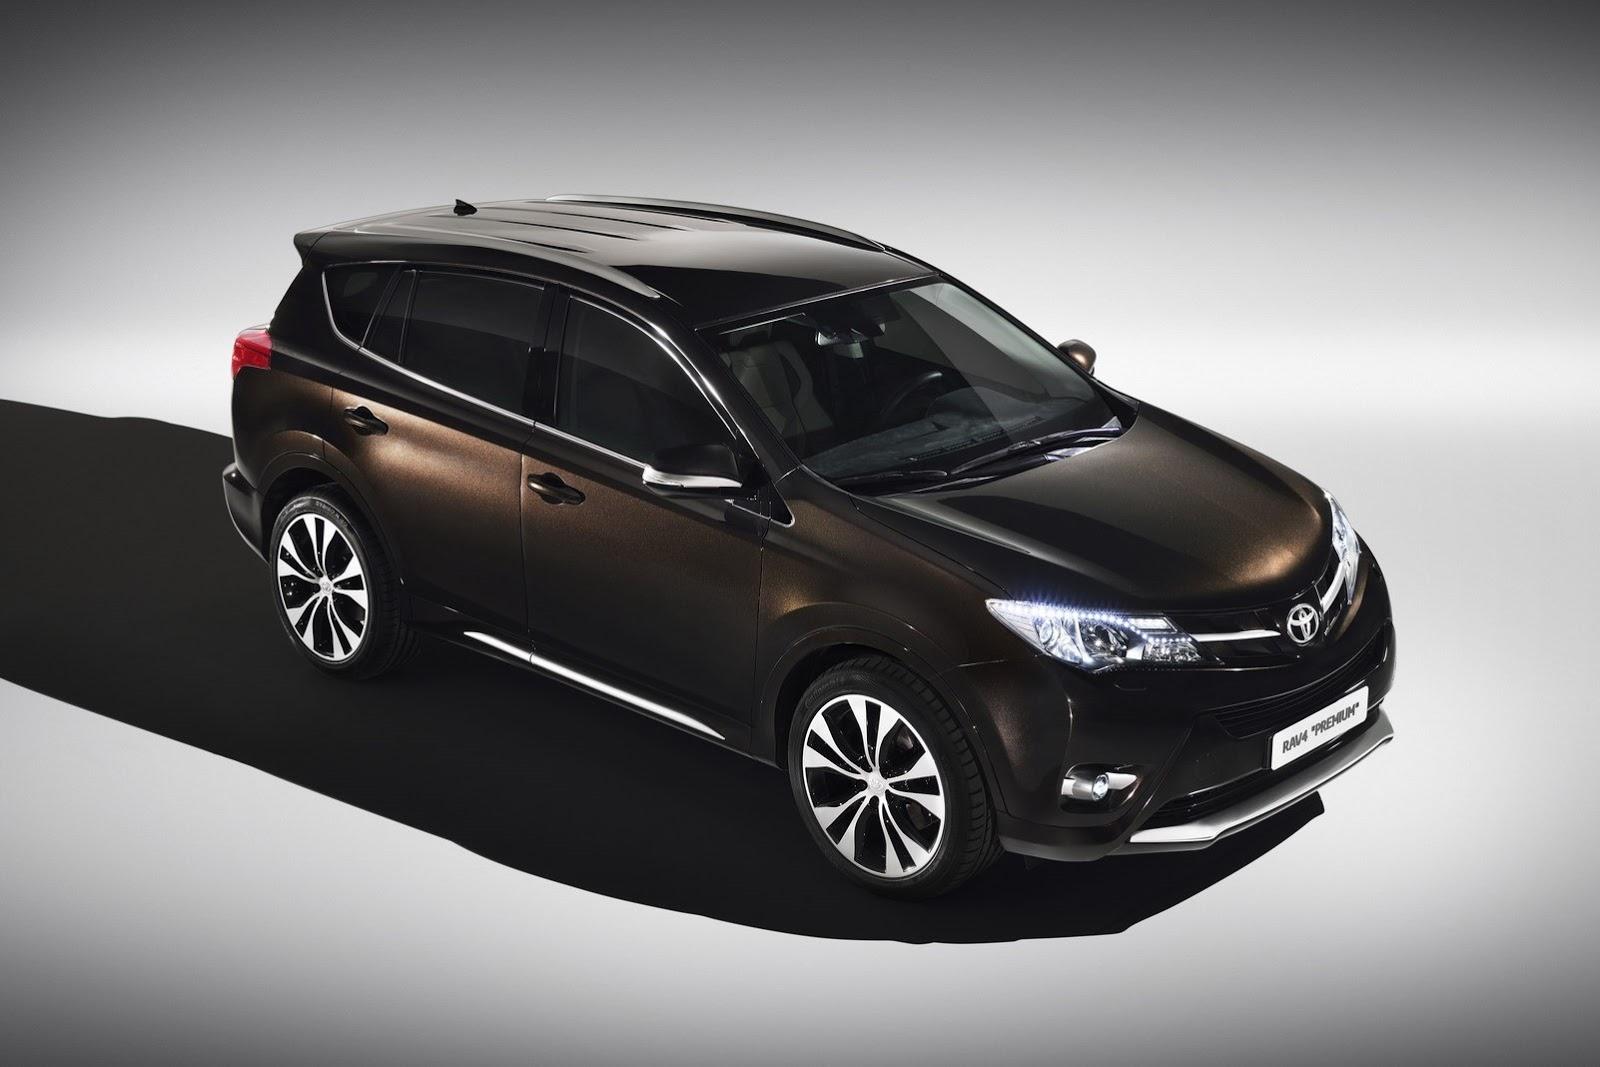 Toyota Rav4 Se >> Toyota Gets Tough, Luxurious with New RAV4 Concepts ...